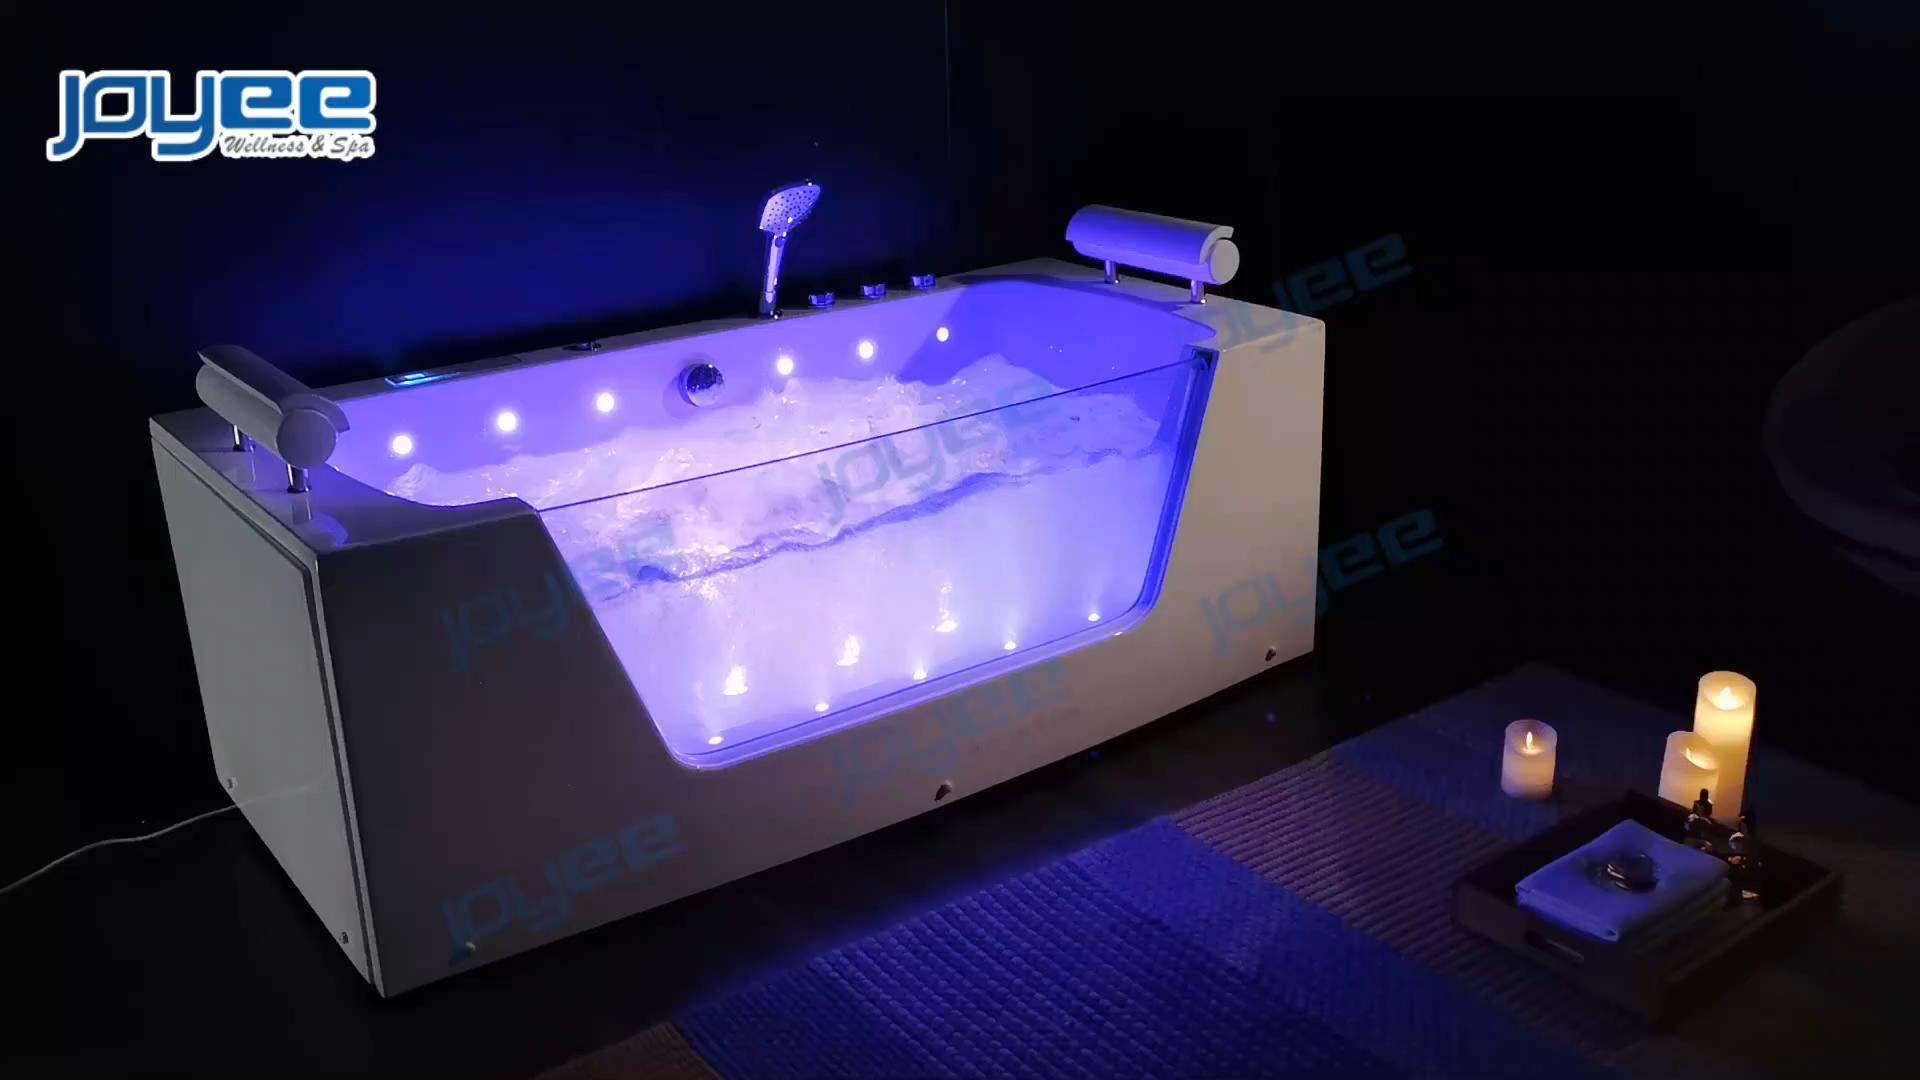 JOYEE 2020 tempered glass side whirlpools massage acrylic hotel bathroom massage whirlpool bathtub  with LED massage jets